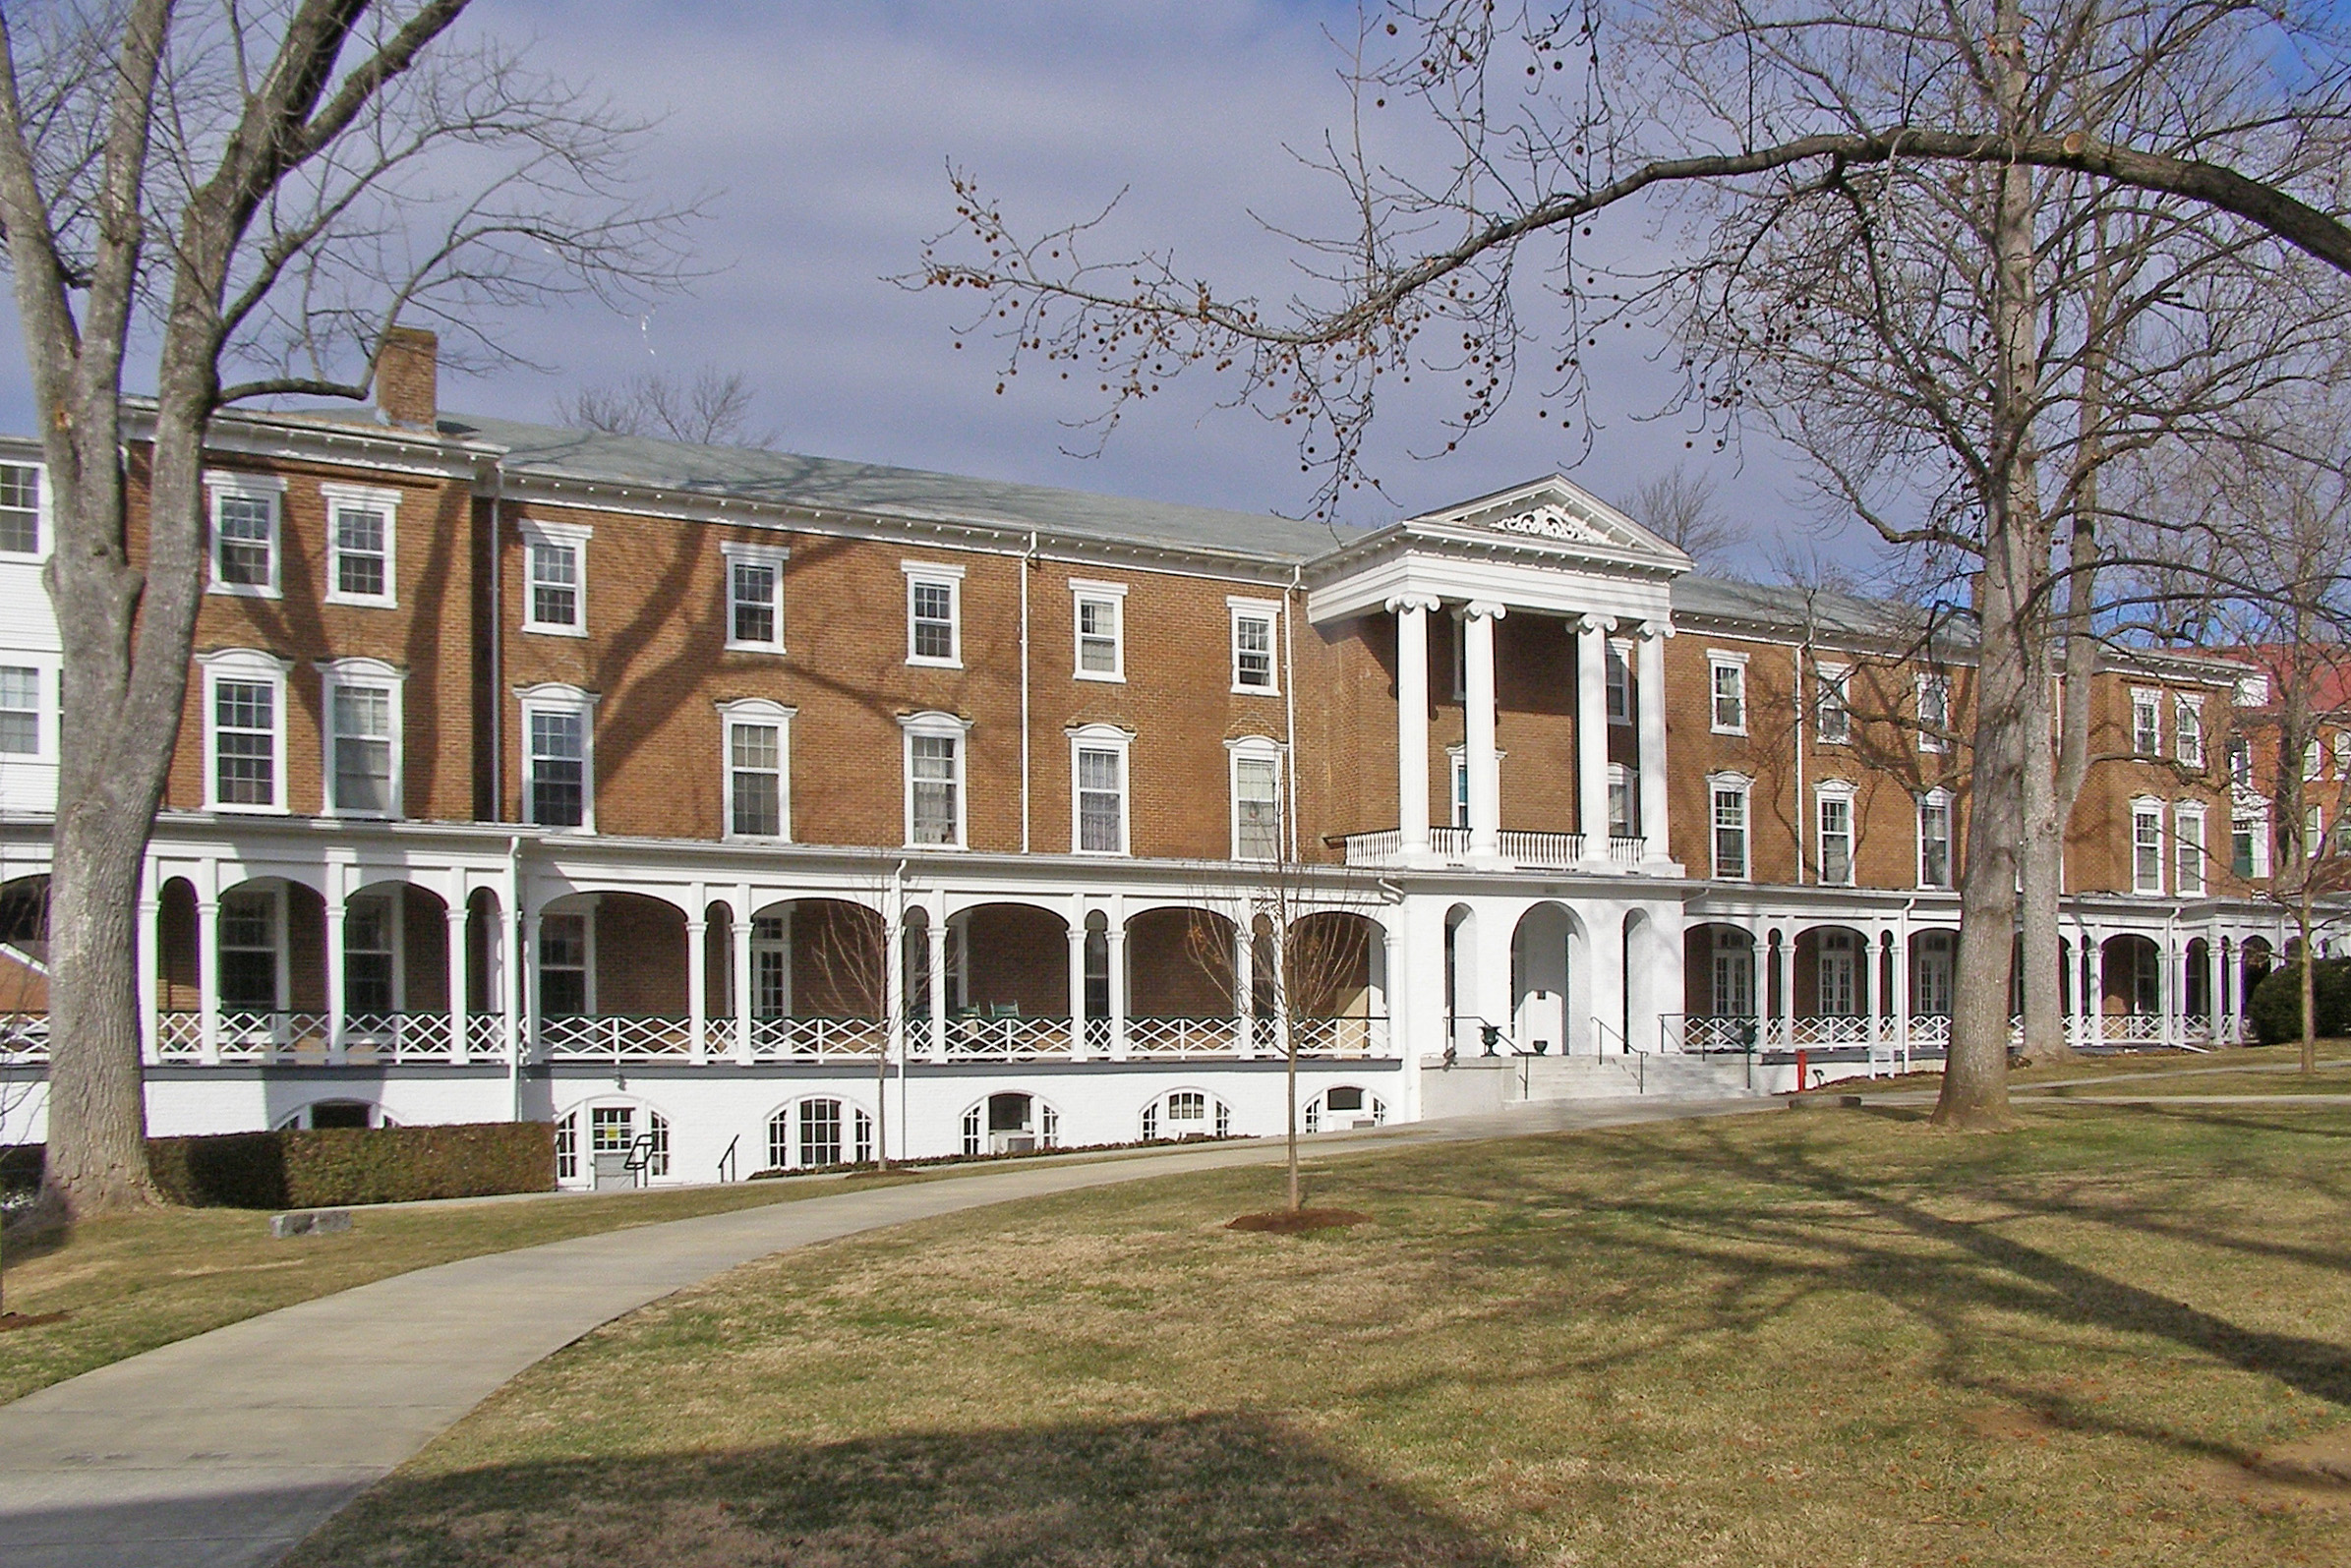 Hollins College Quadrangle